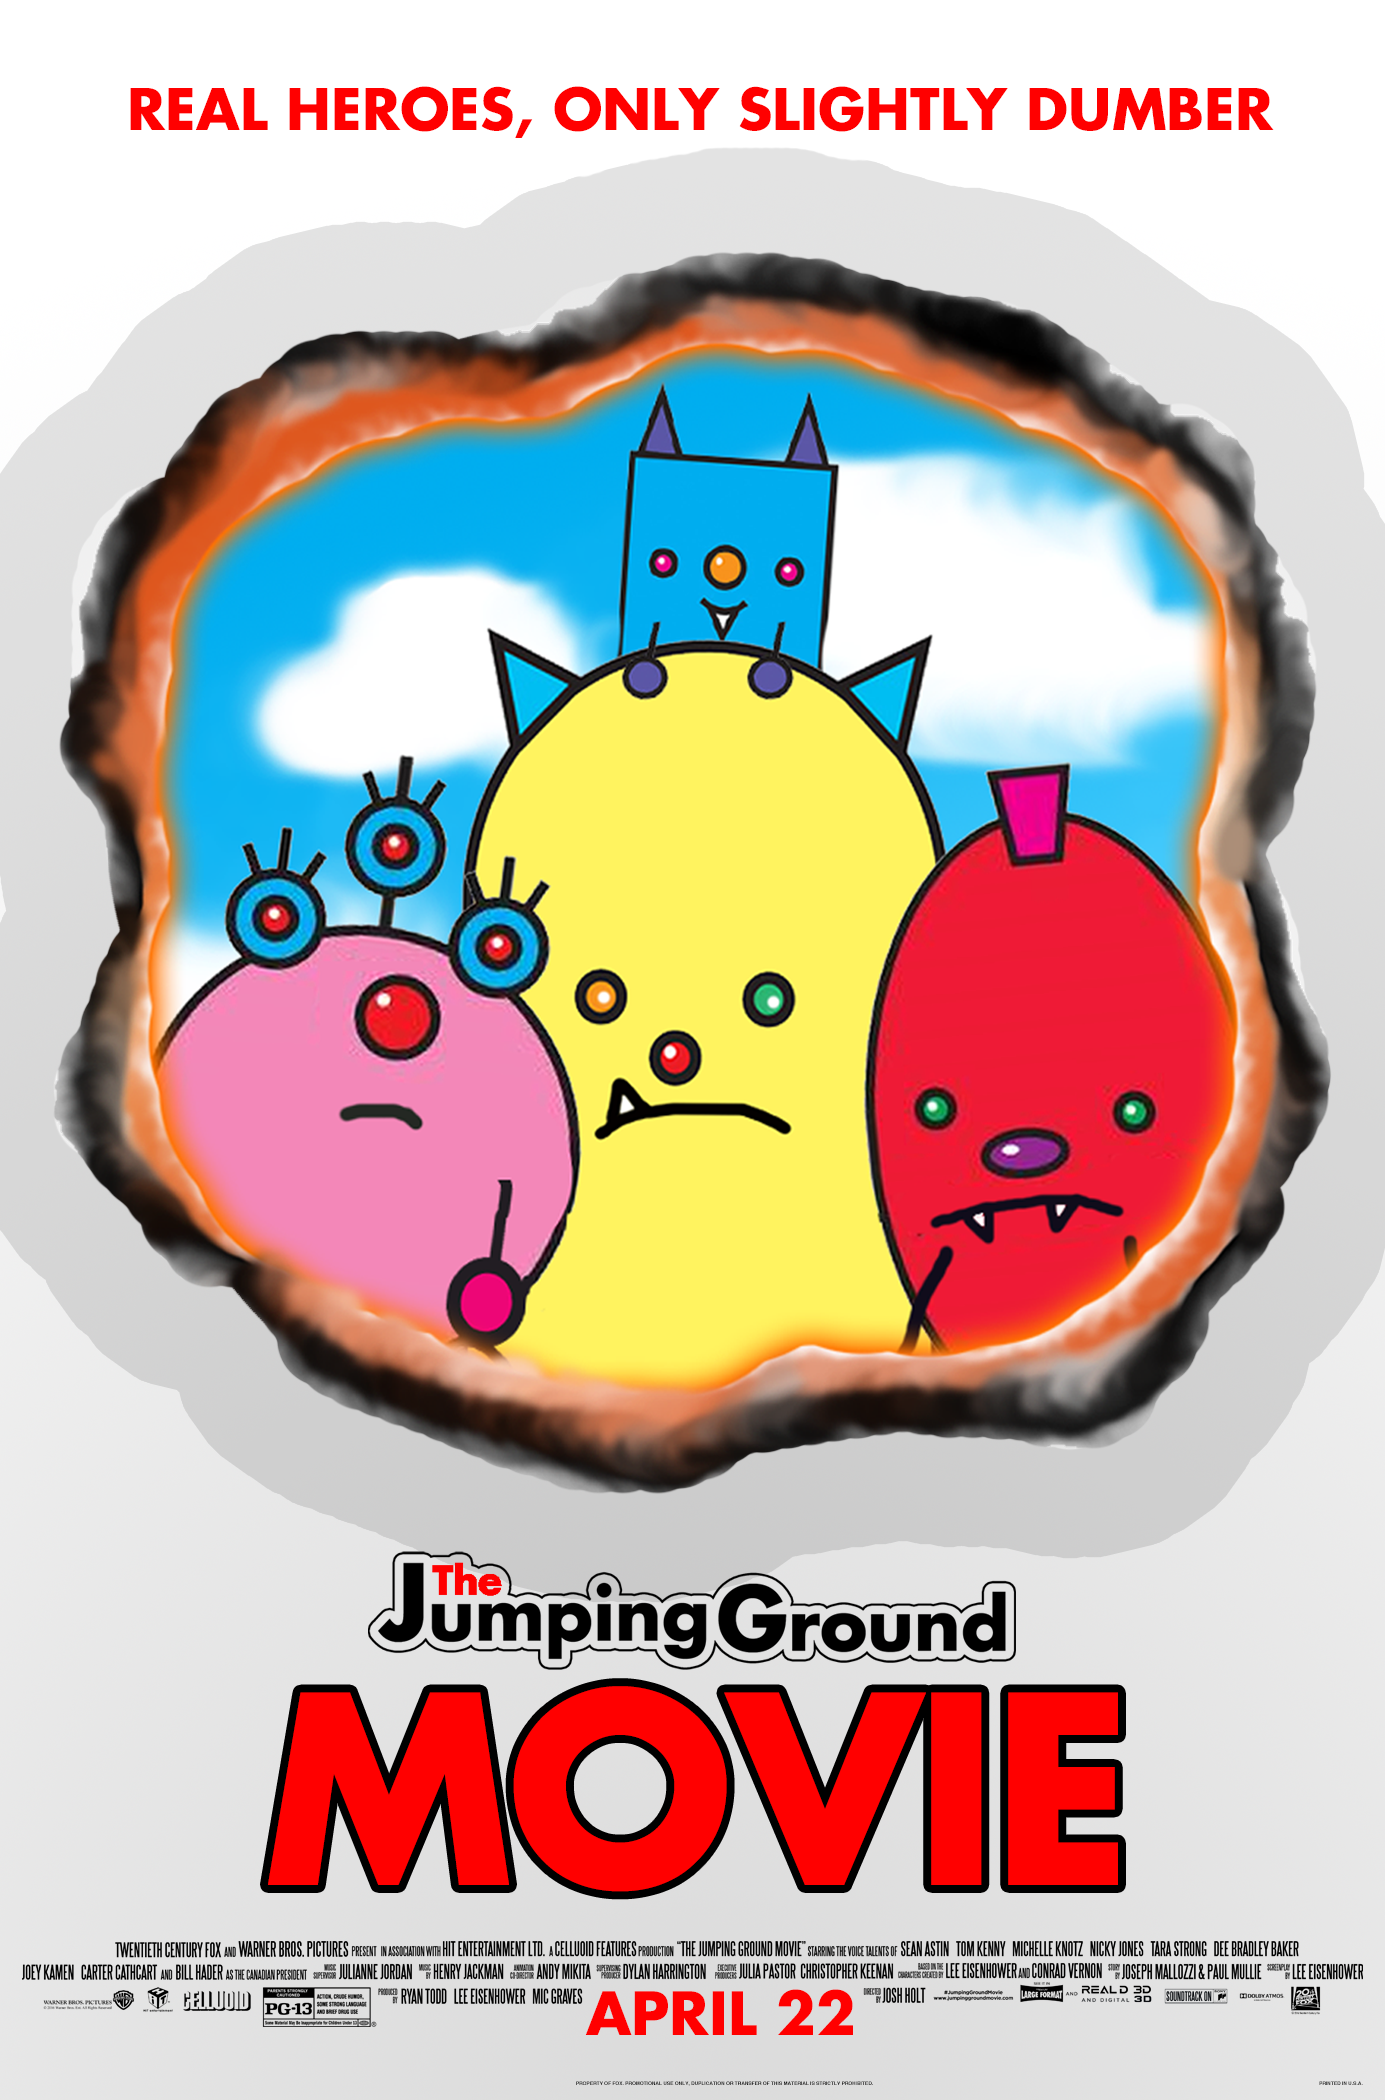 The Jumping Ground Movie